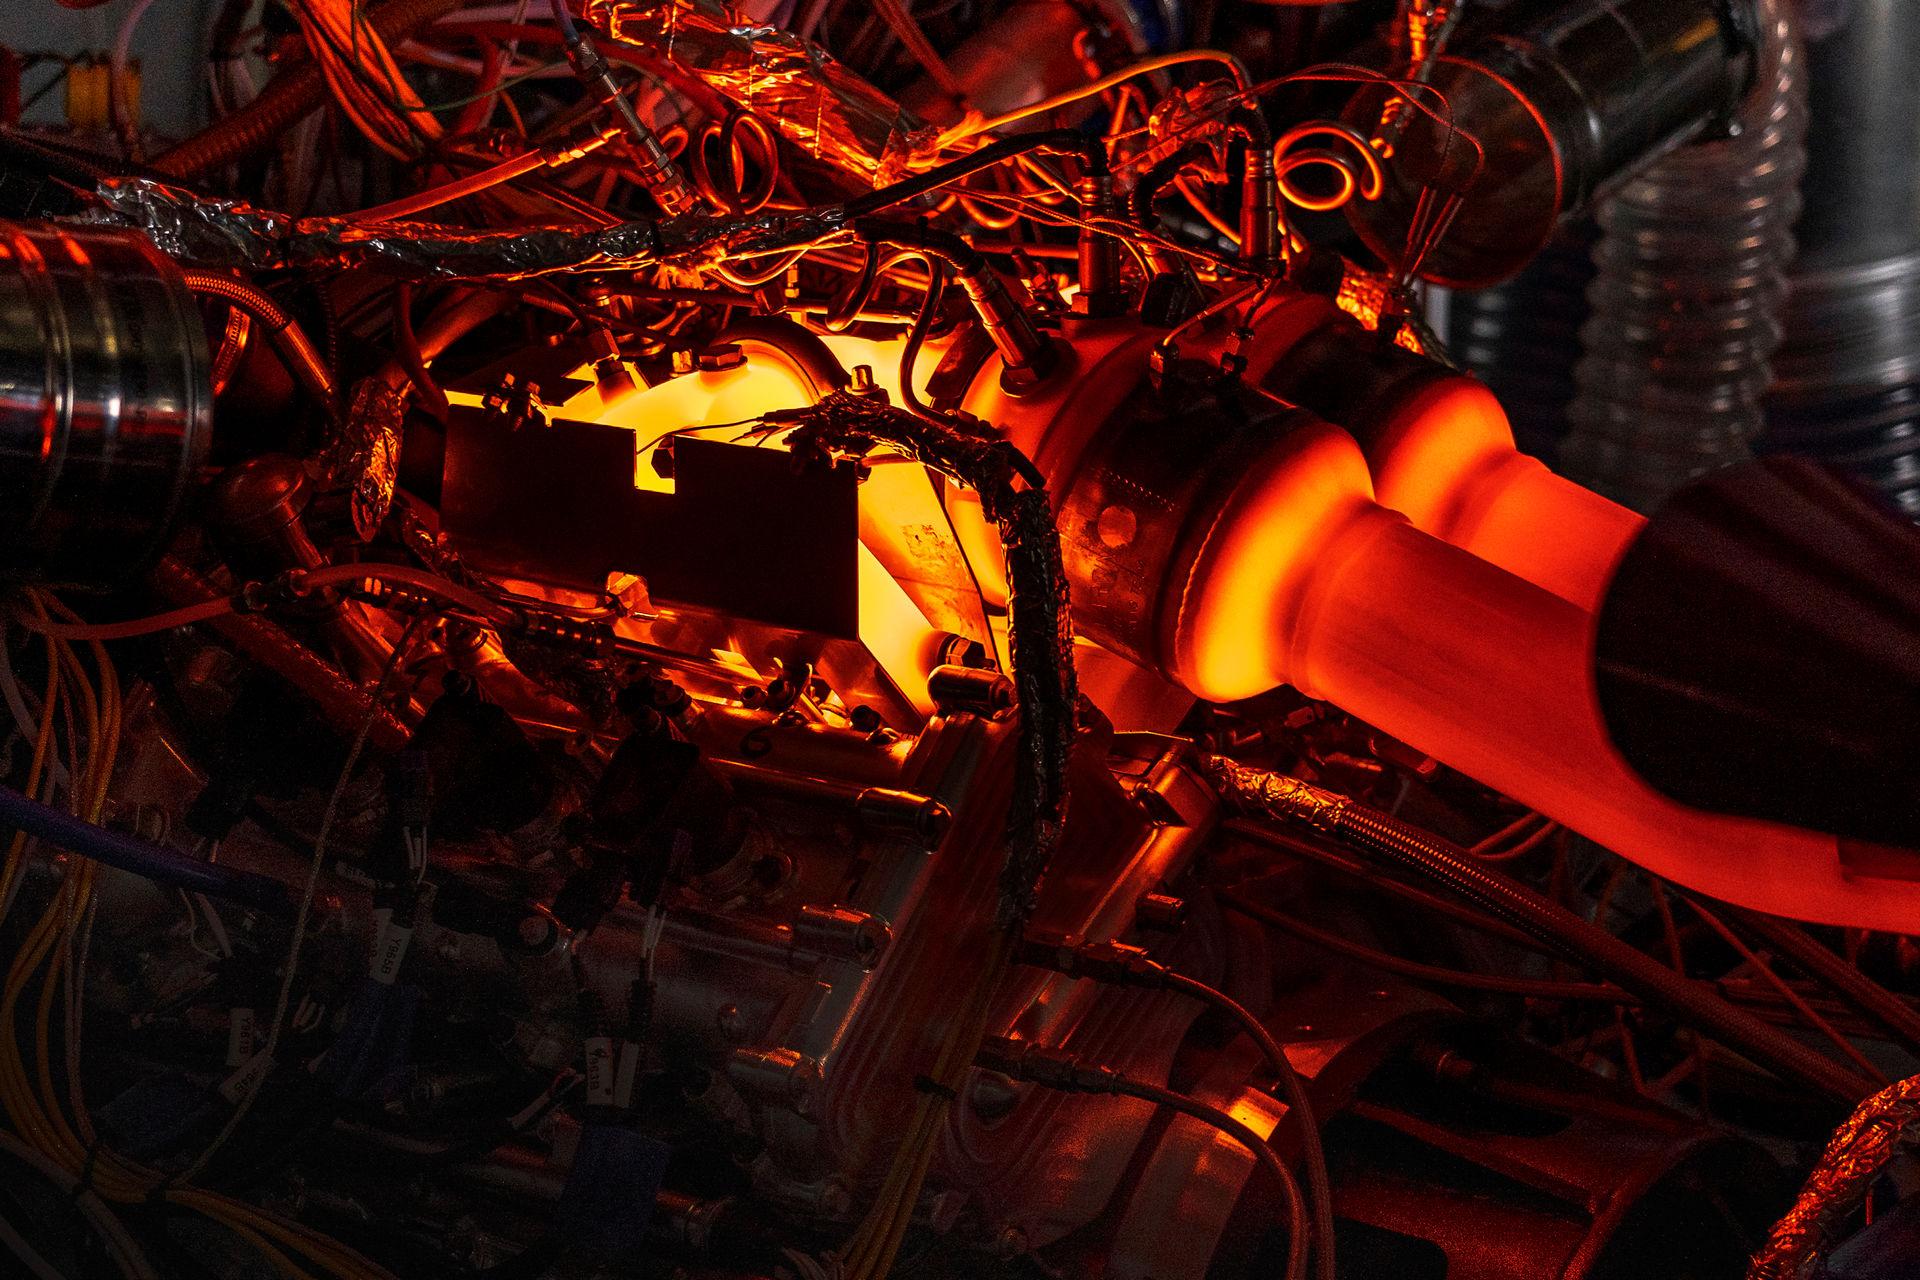 New-Aston-Martin-V6-Engine-10